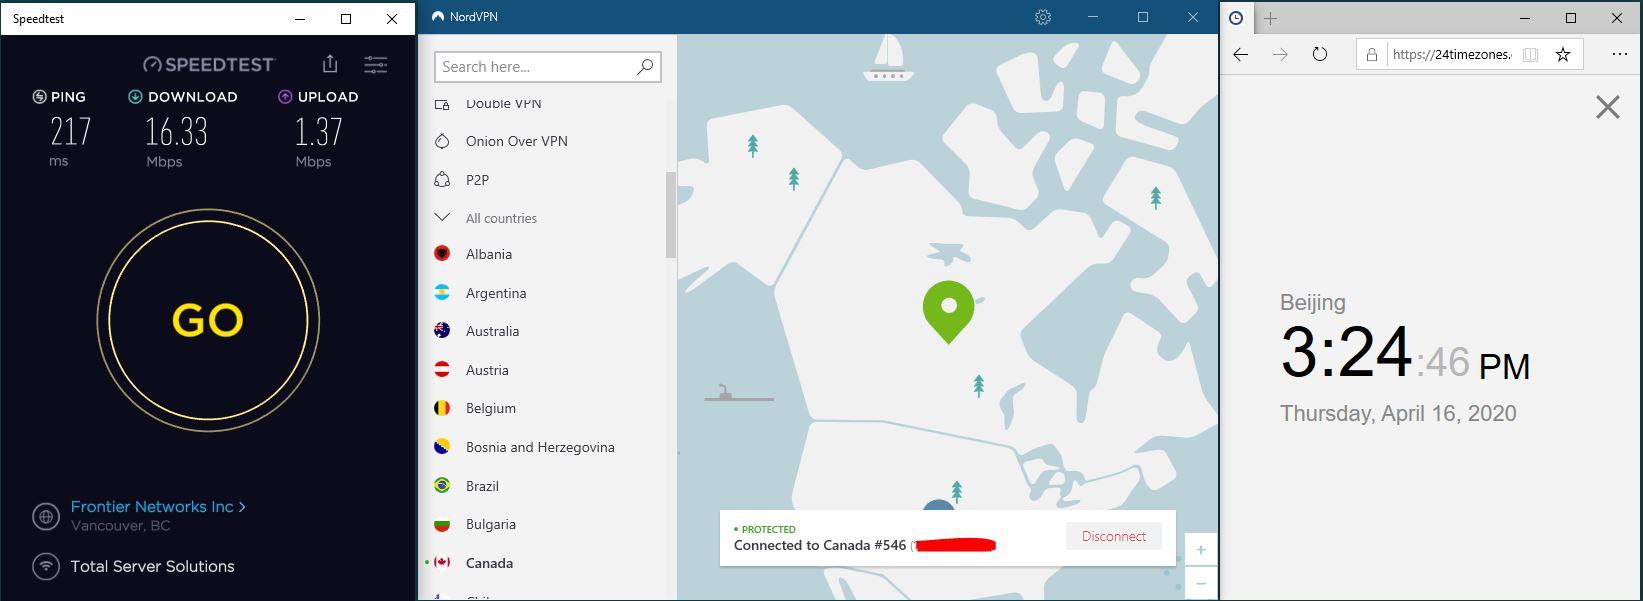 Windows10 NordVPN Canada #546 中国VPN 翻墙 科学上网 SpeedTest测速-20200416